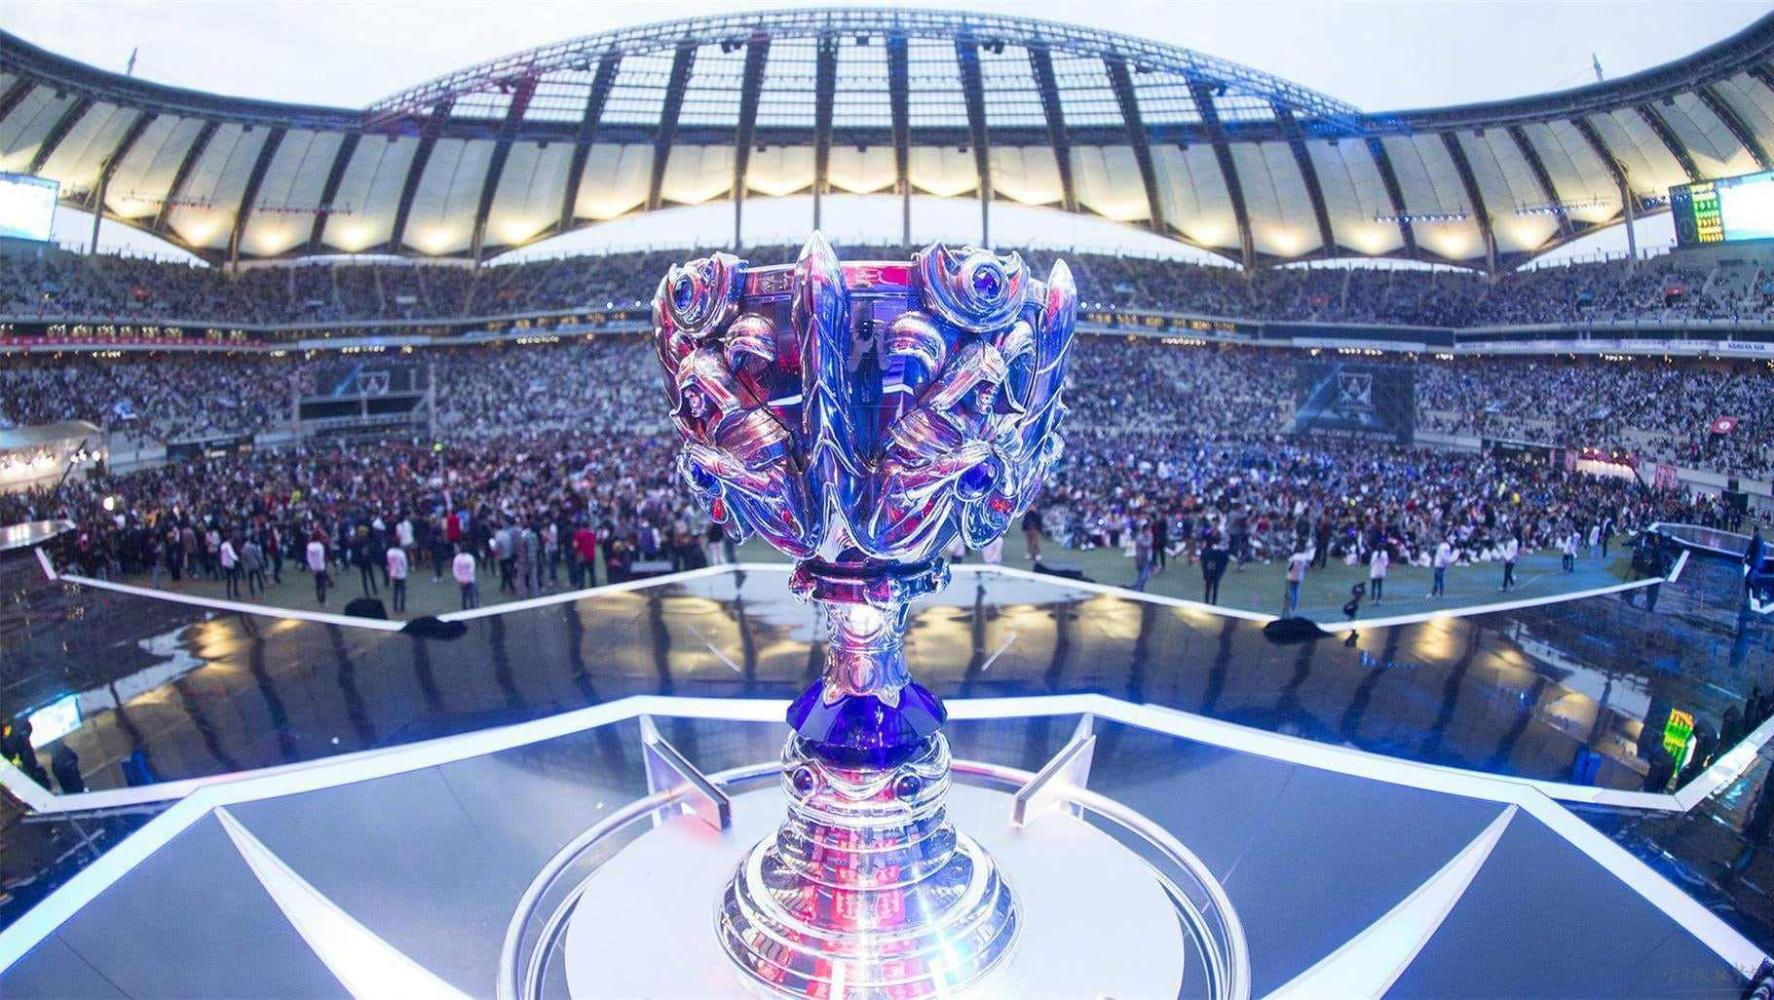 S10落地上海,是中国队将冠军奖杯留下的最好机会